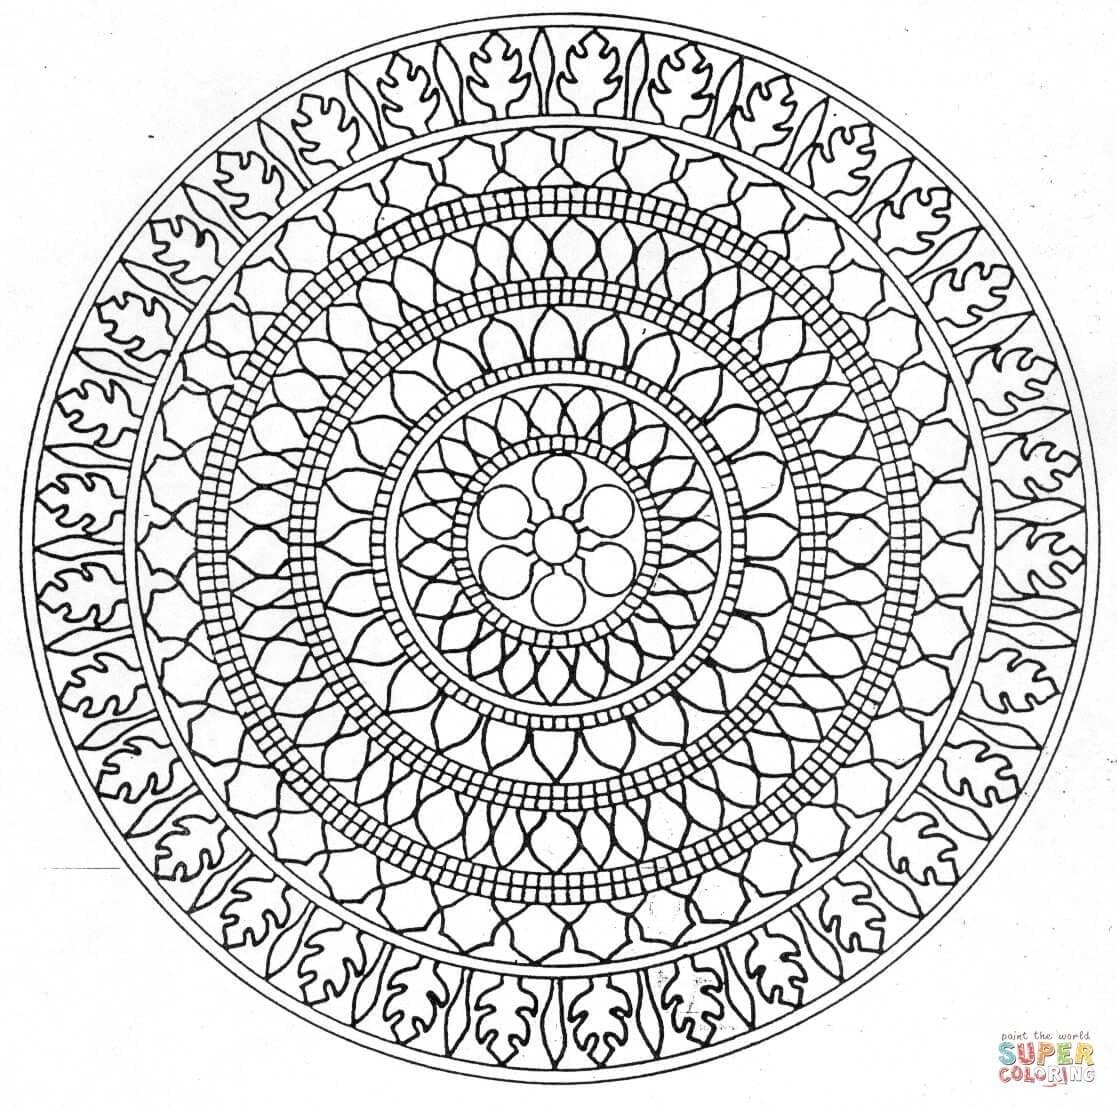 29 Printable Mandala & Abstract Colouring Pages For Meditation